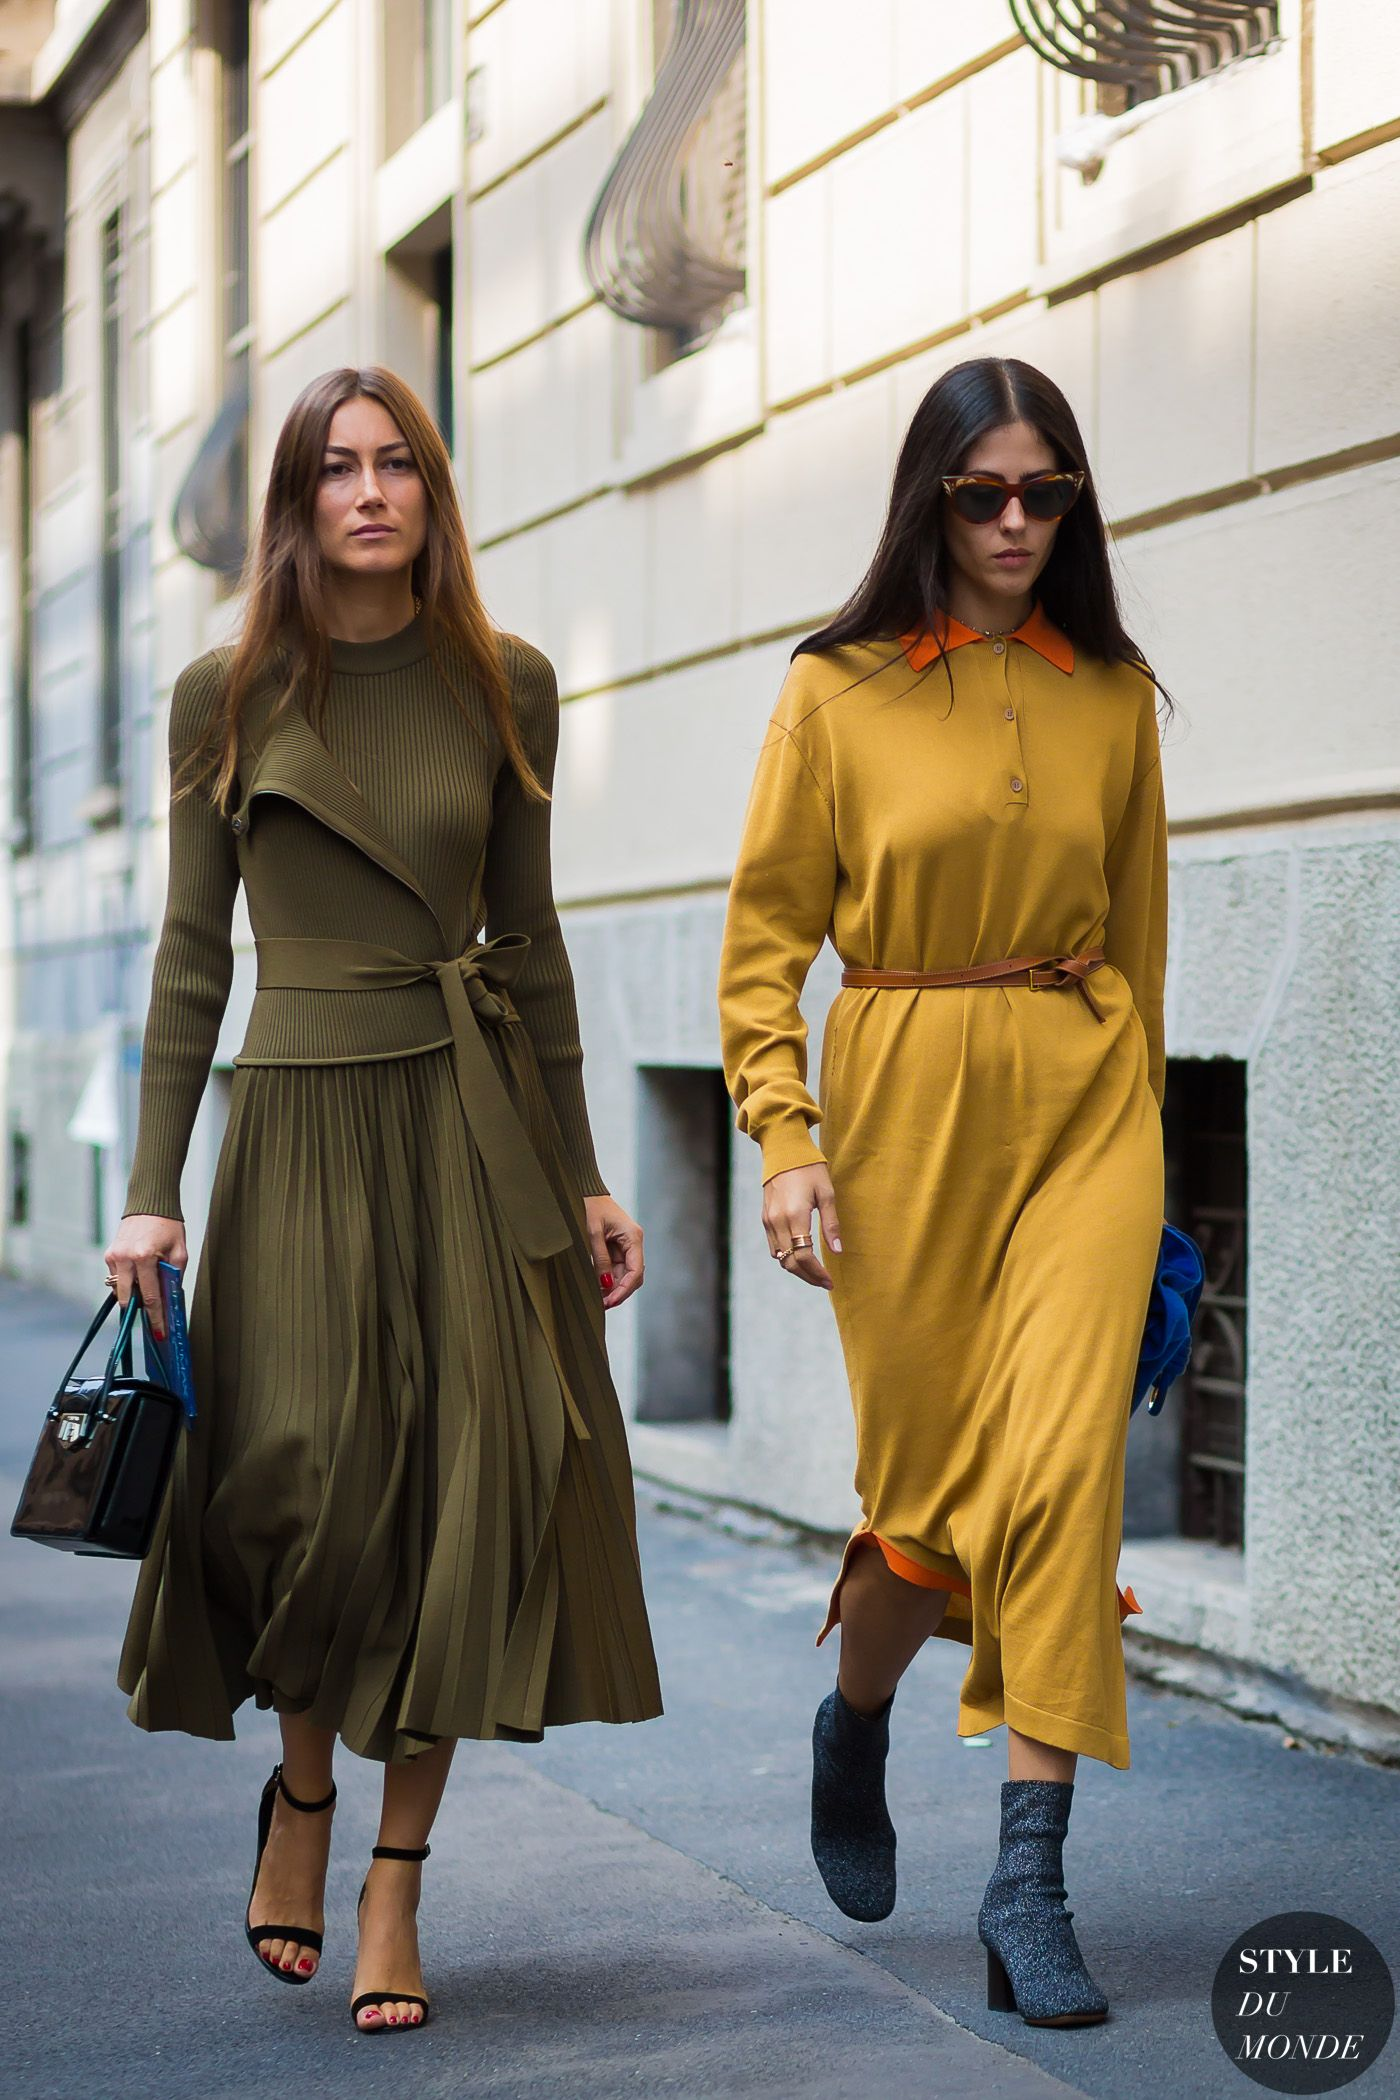 1bb56a16a8 Giorgia Tordini and Gilda Ambrosio by STYLEDUMONDE Street Style Fashion  Photography